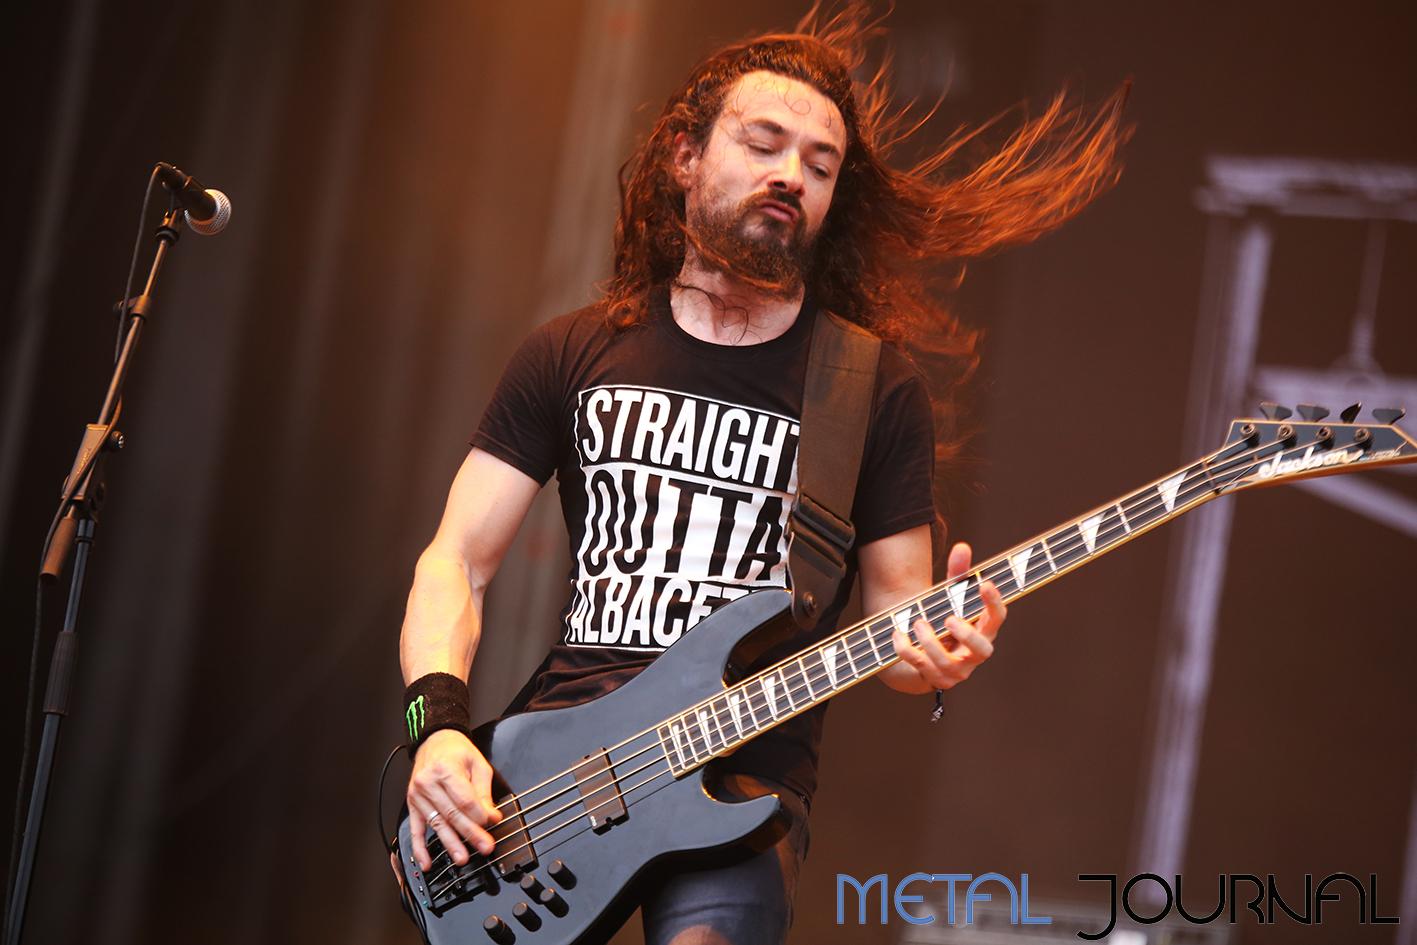 angelus apatrida - metal journal rock fest barcelona 2019 pic 4